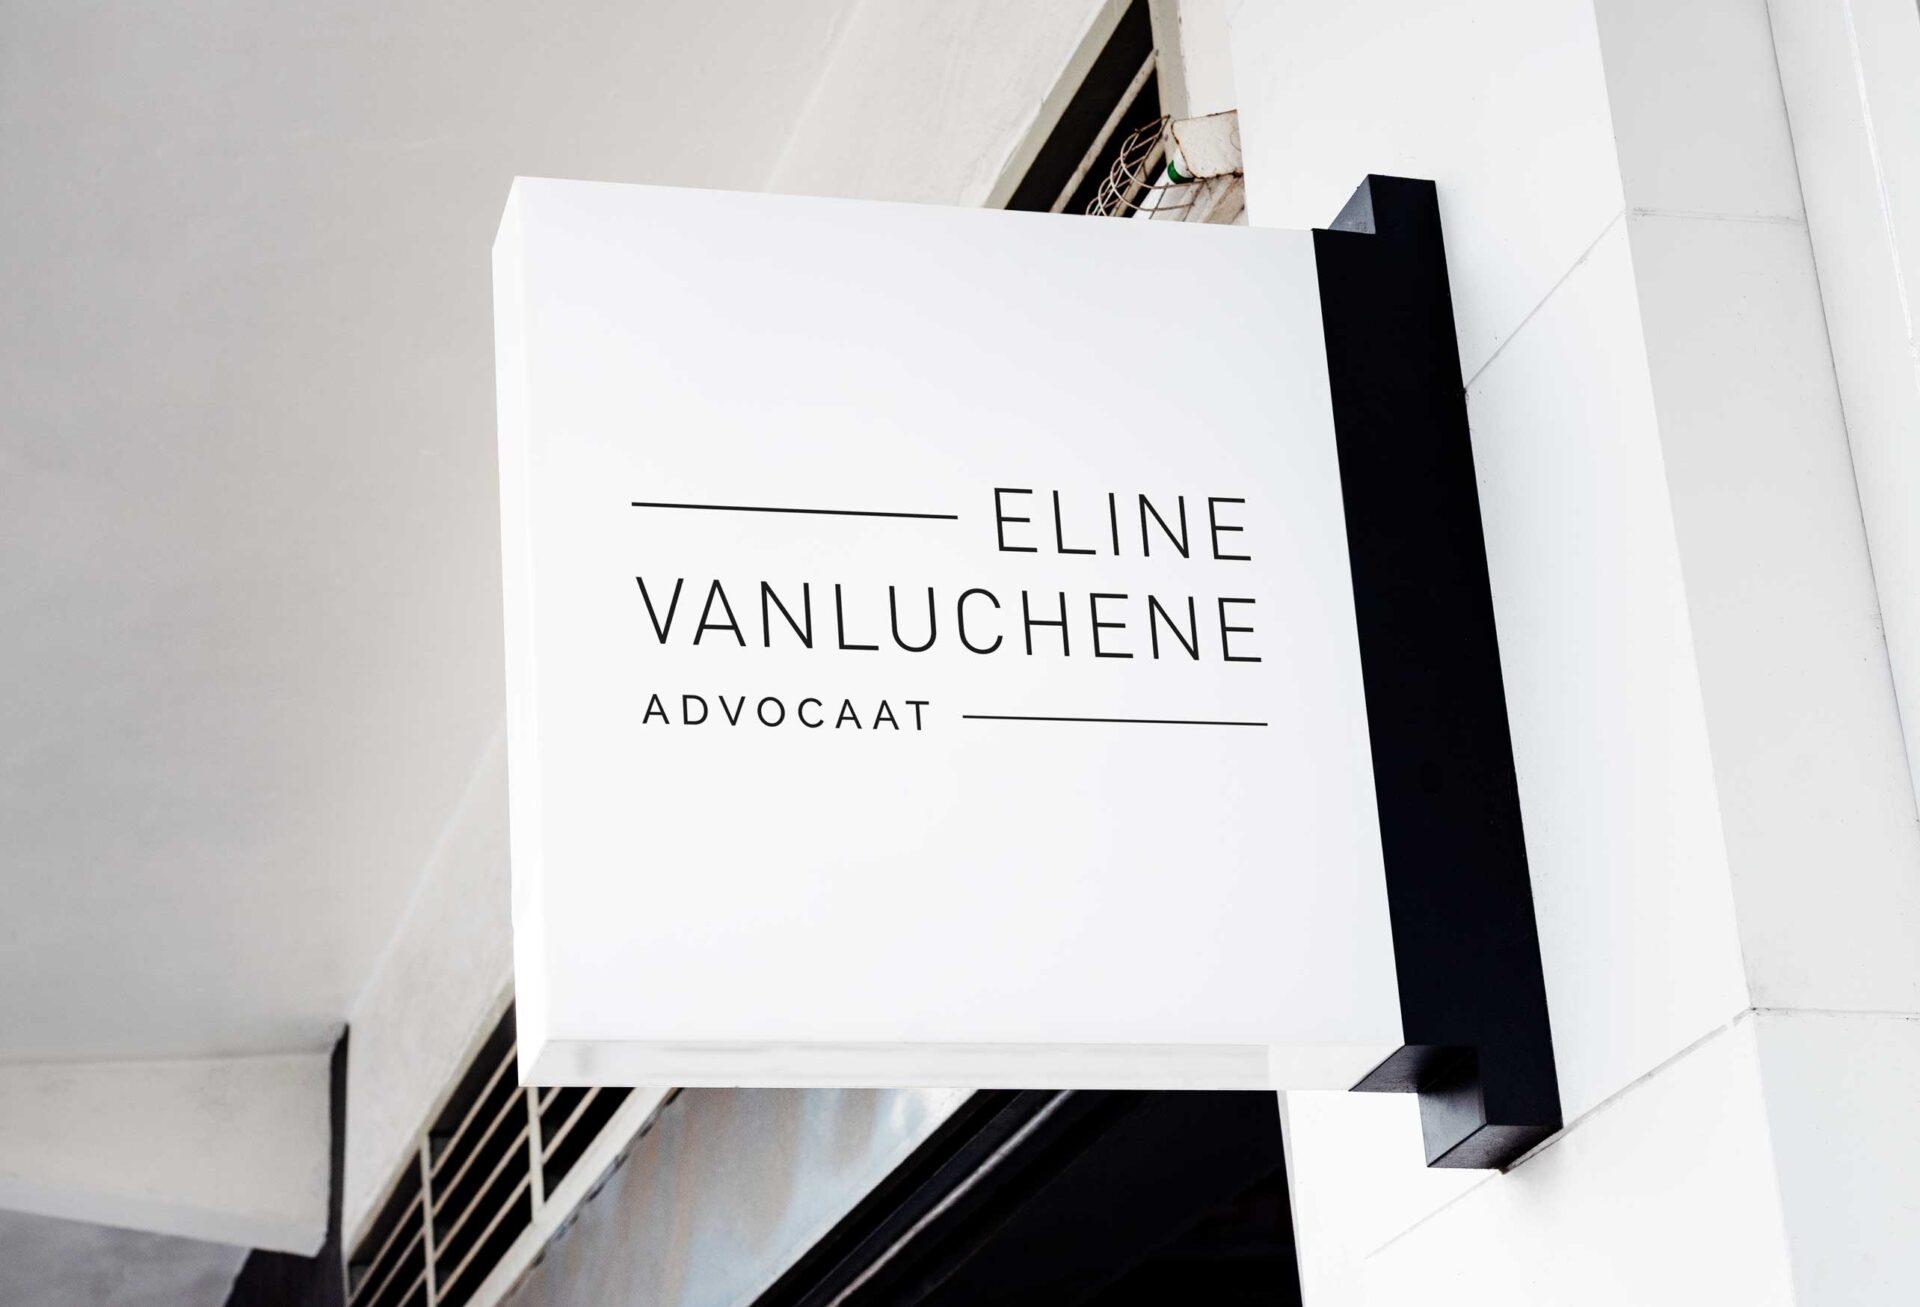 Eline Vanluchene Display